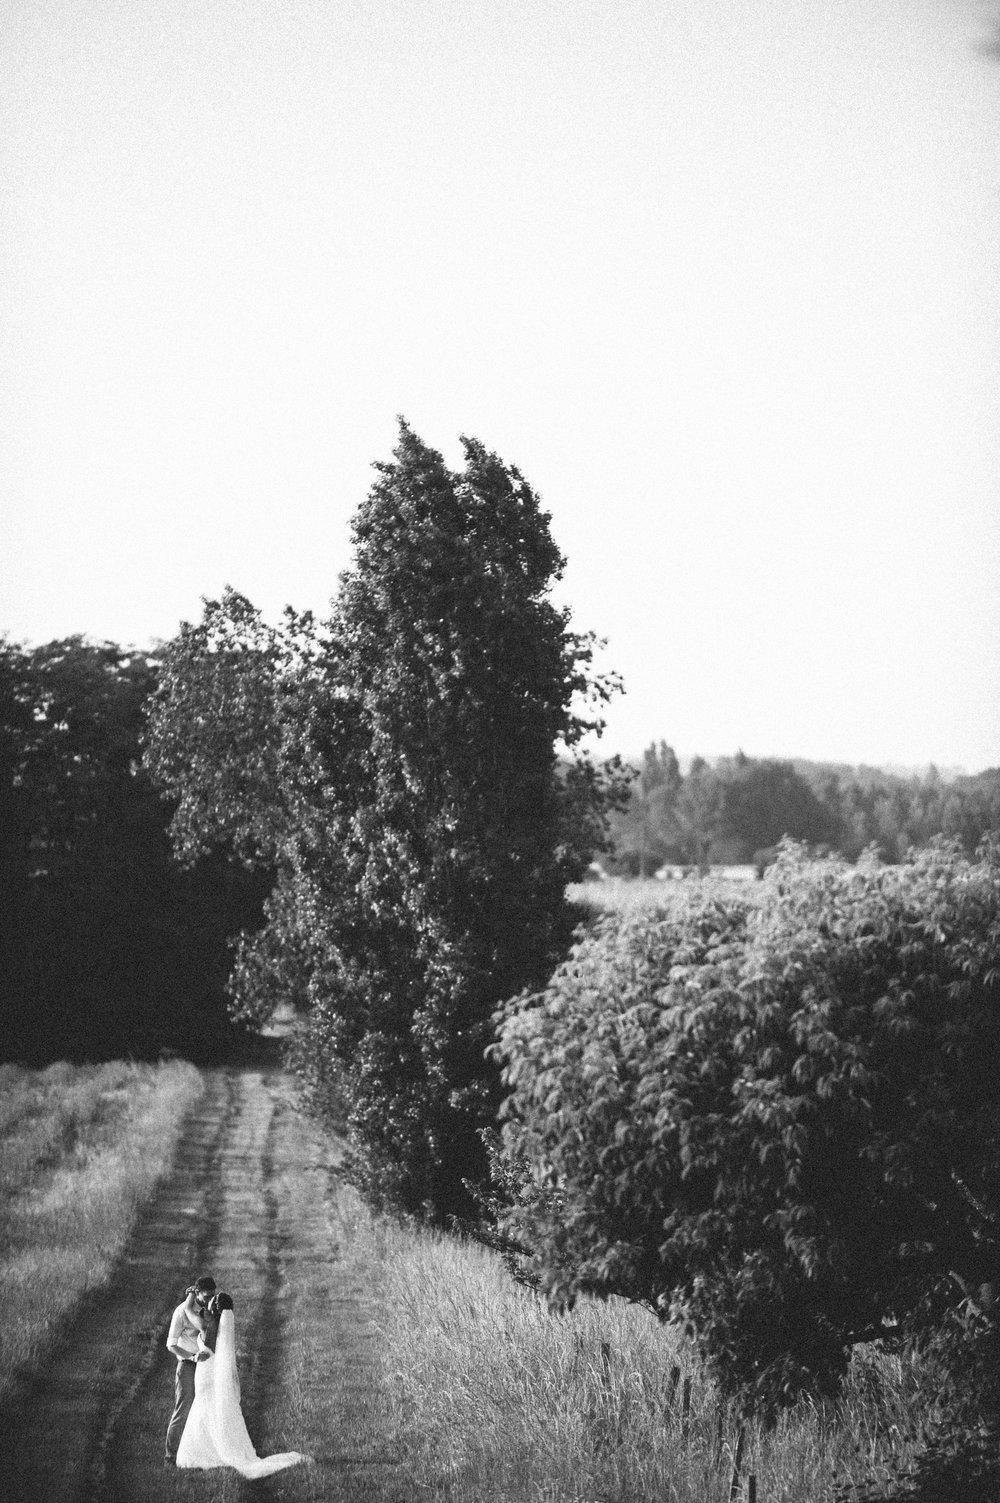 harrera images-045.jpg